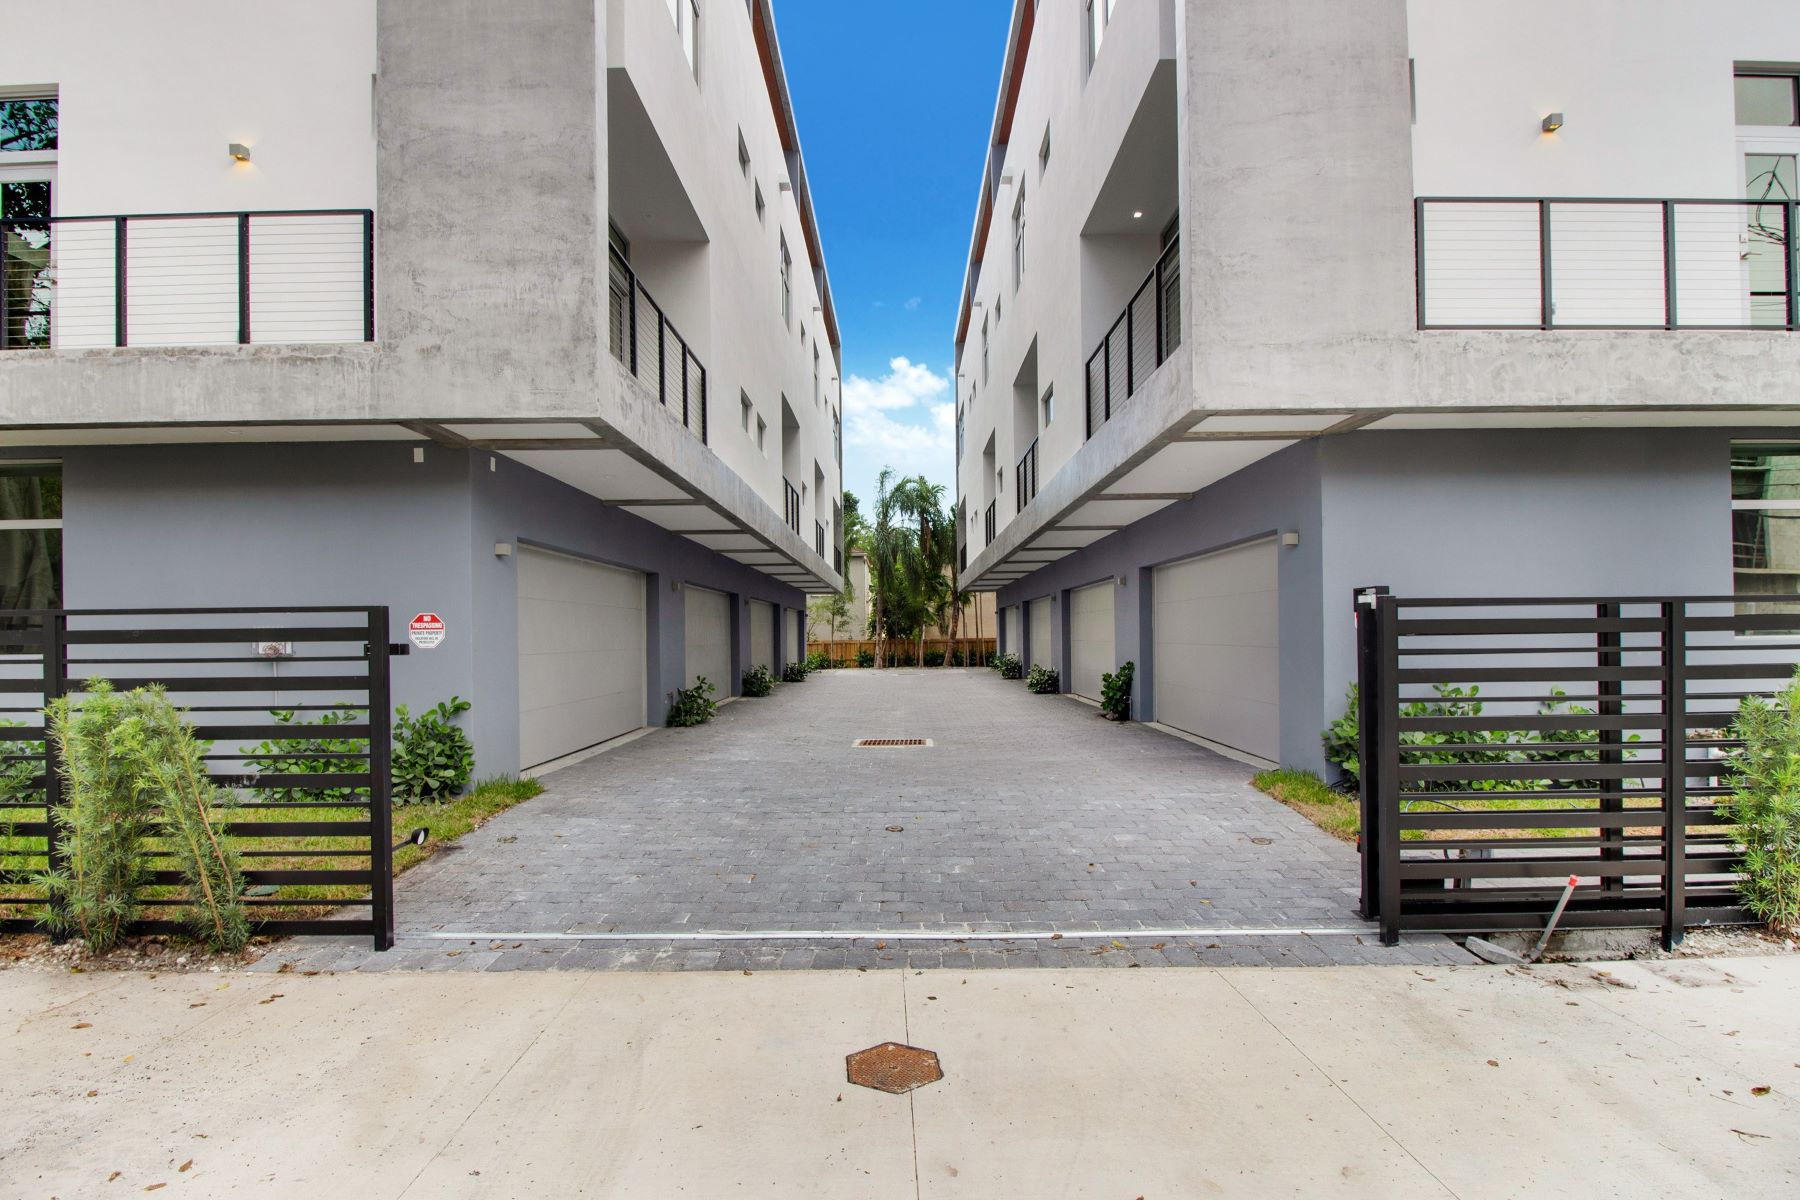 townhouses por un Venta en 2924 Bird Avenue 1 Coconut Grove, Florida 33133 Estados Unidos